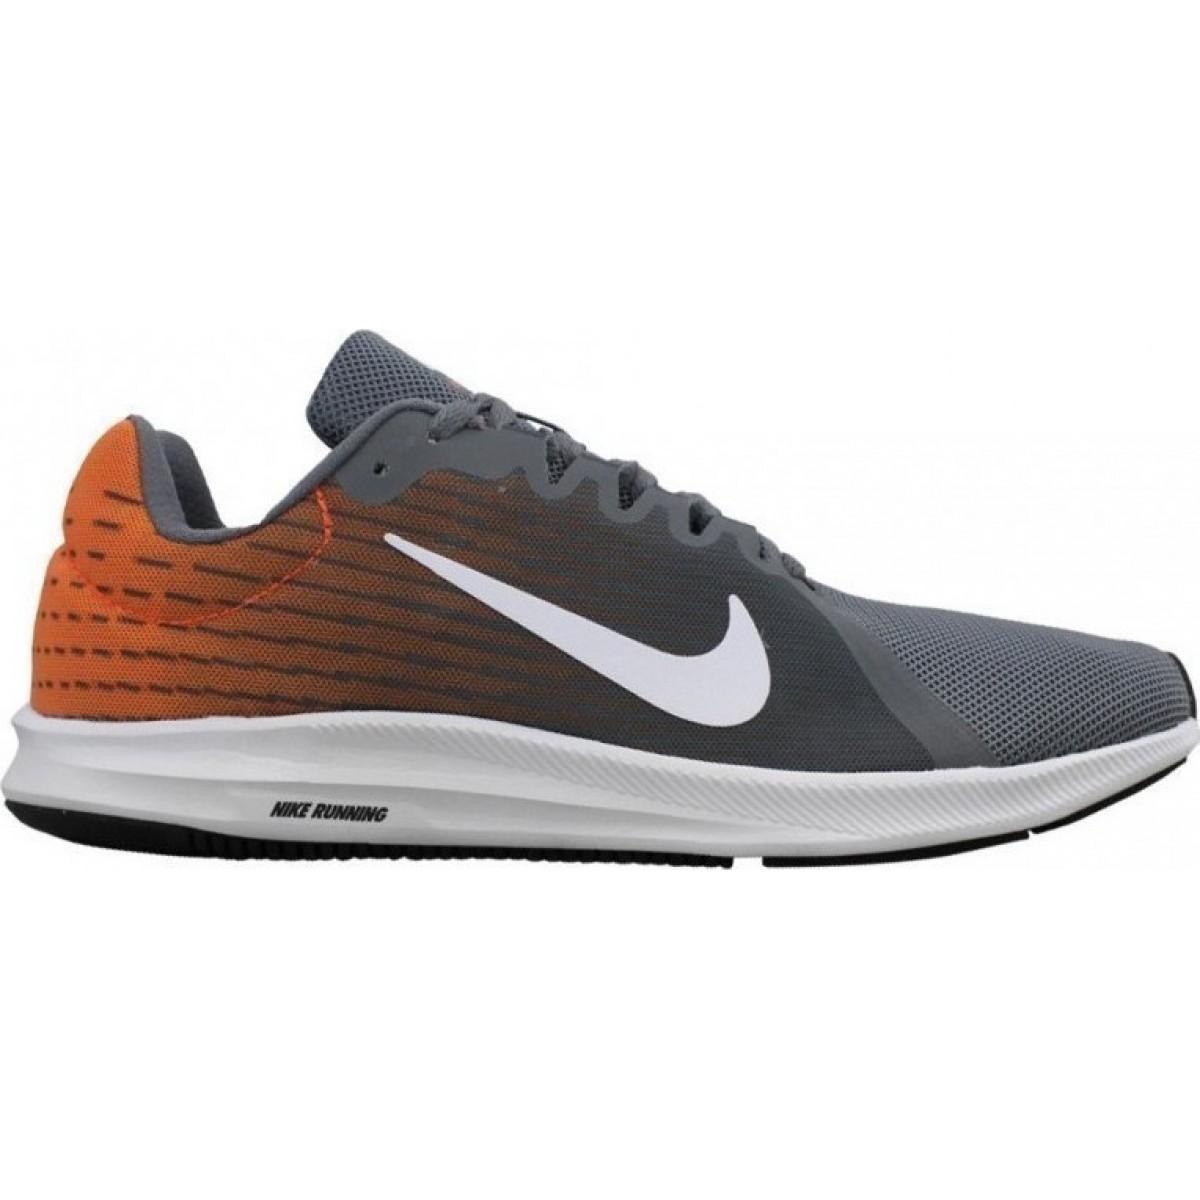 Nike Downshifter 8 (Grey)